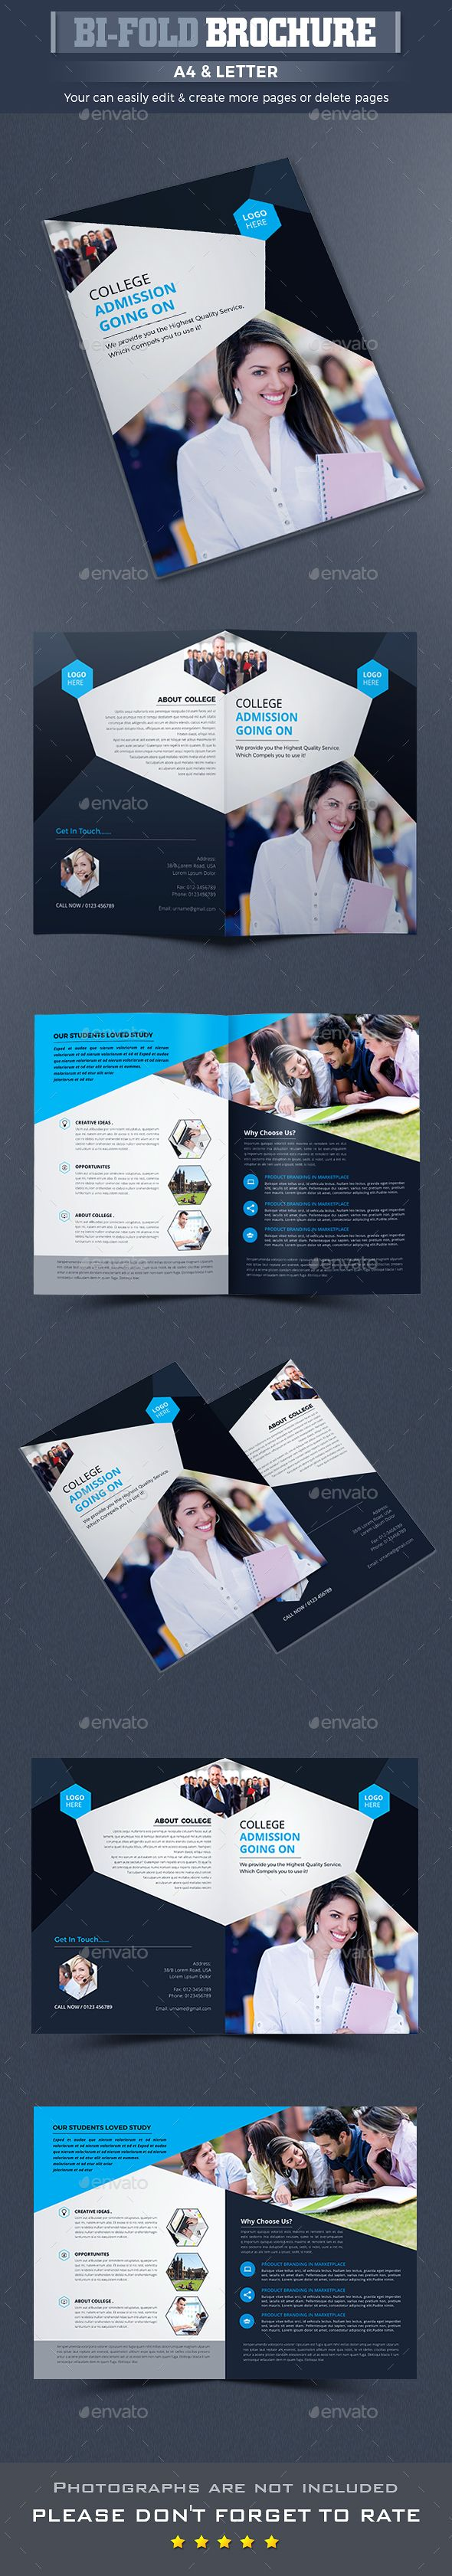 College University Bi-fold Brochure Template InDesign INDD ...